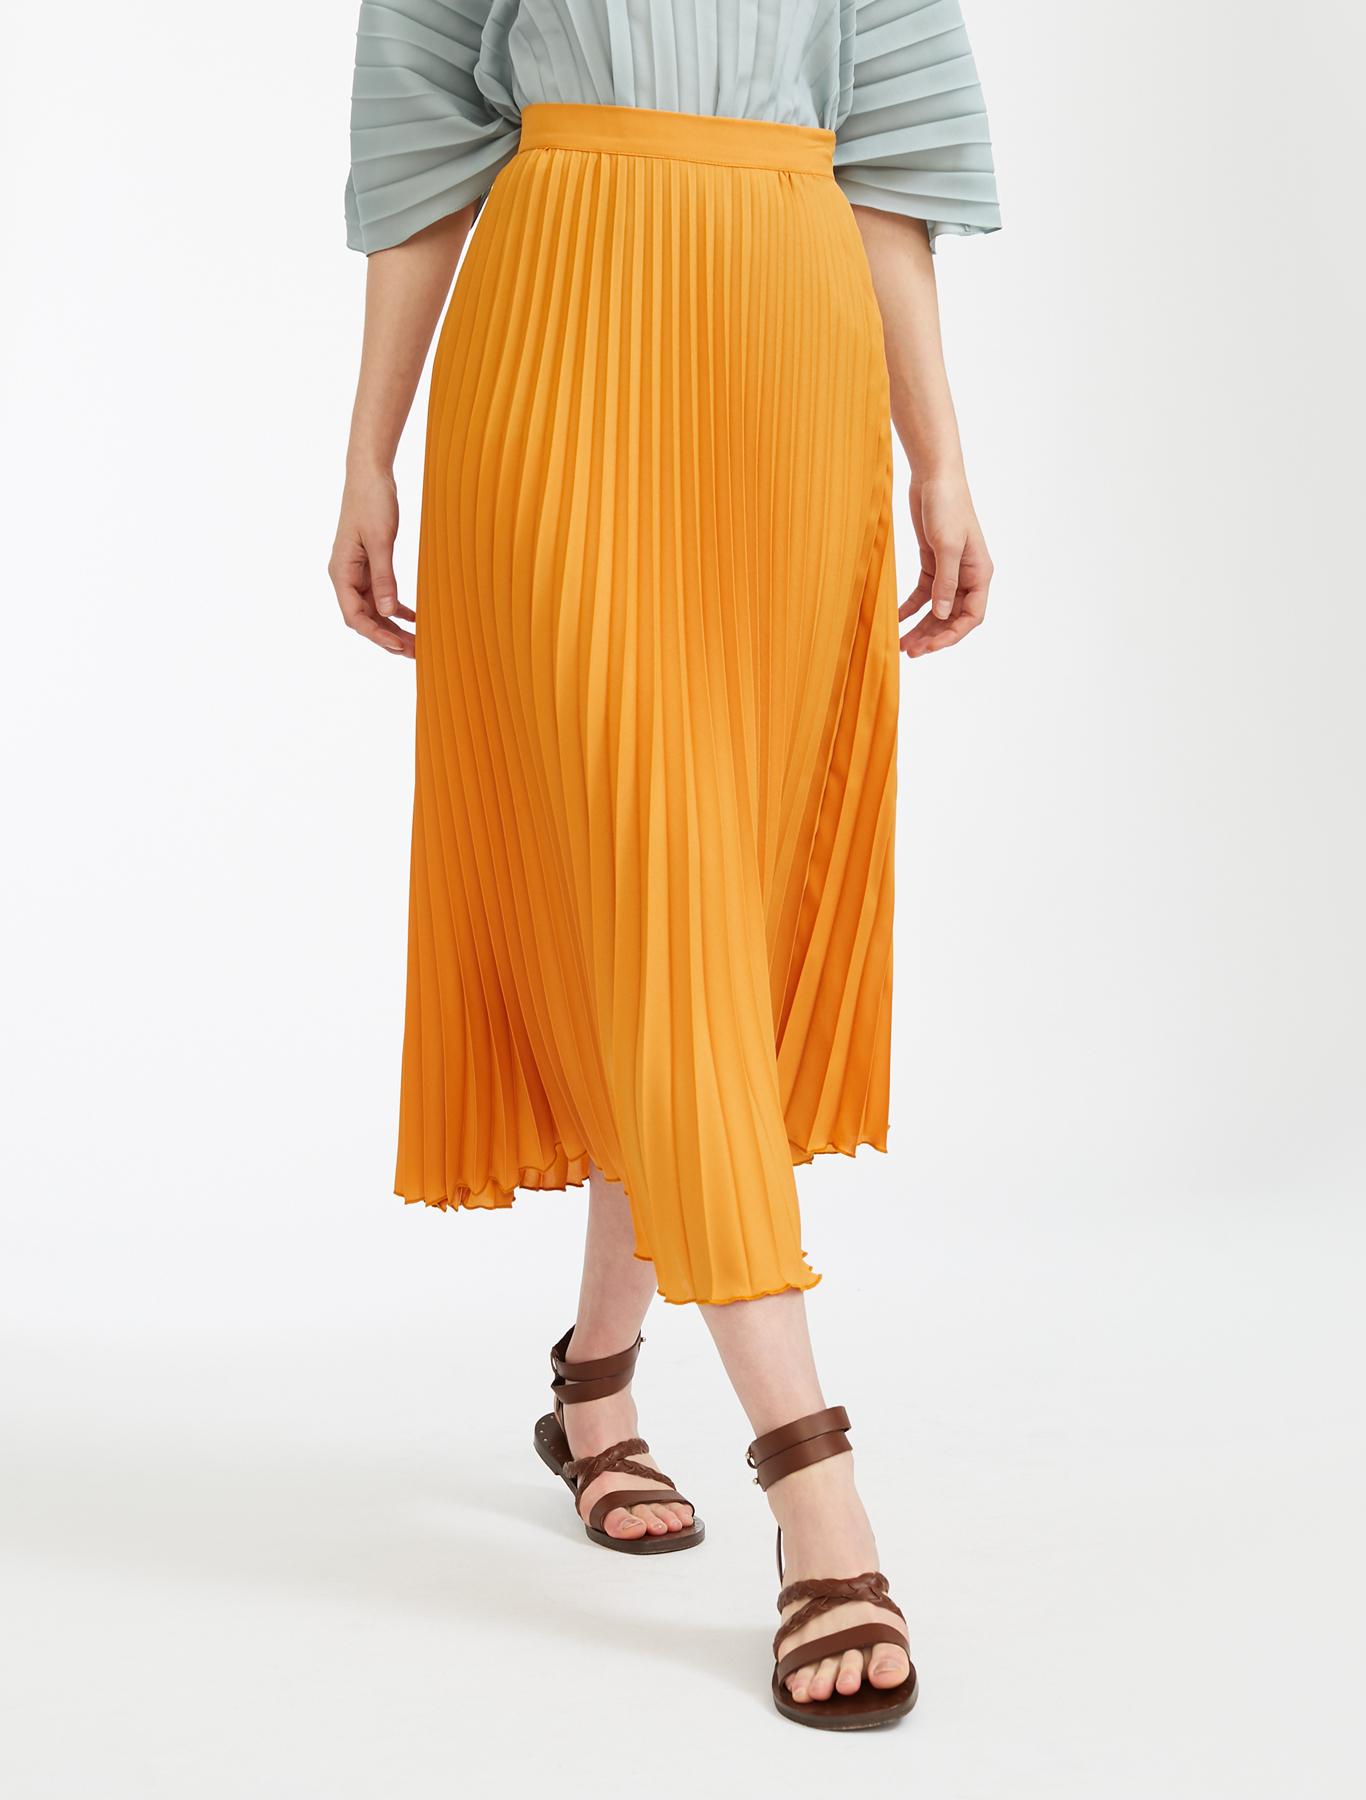 015abc17fe Crepe de chine skirt, orange - Weekend Max Mara